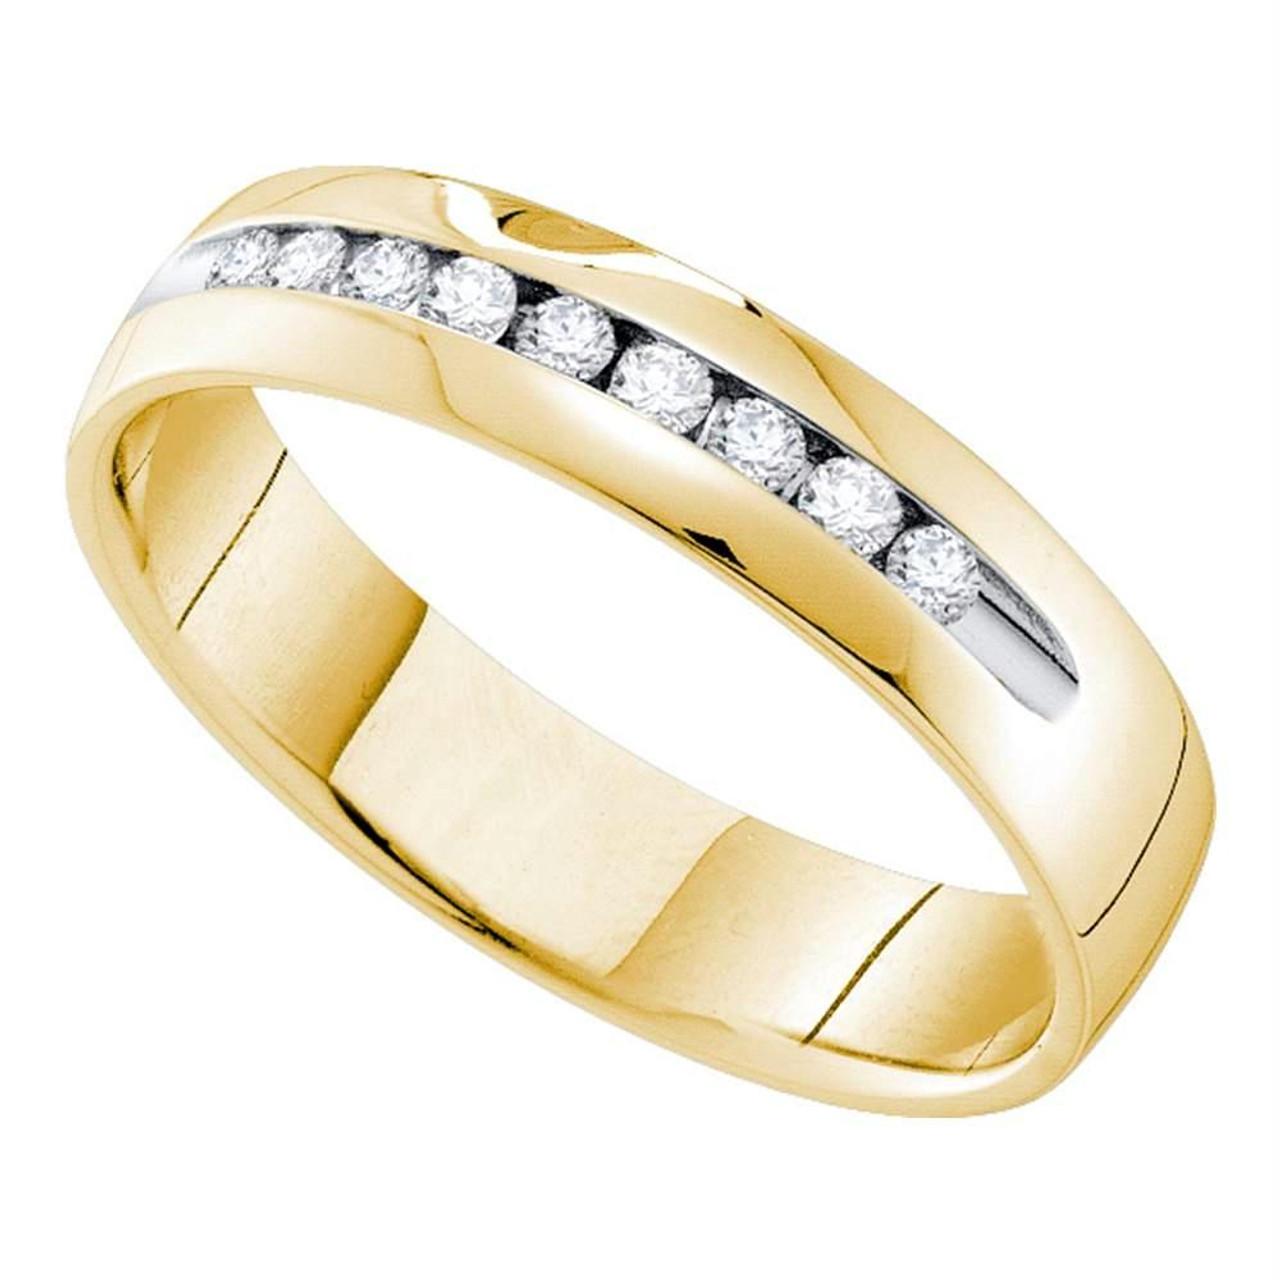 14k Yellow Gold 5 mm Round Diamond Mens Wedding Band Ring Channel Set